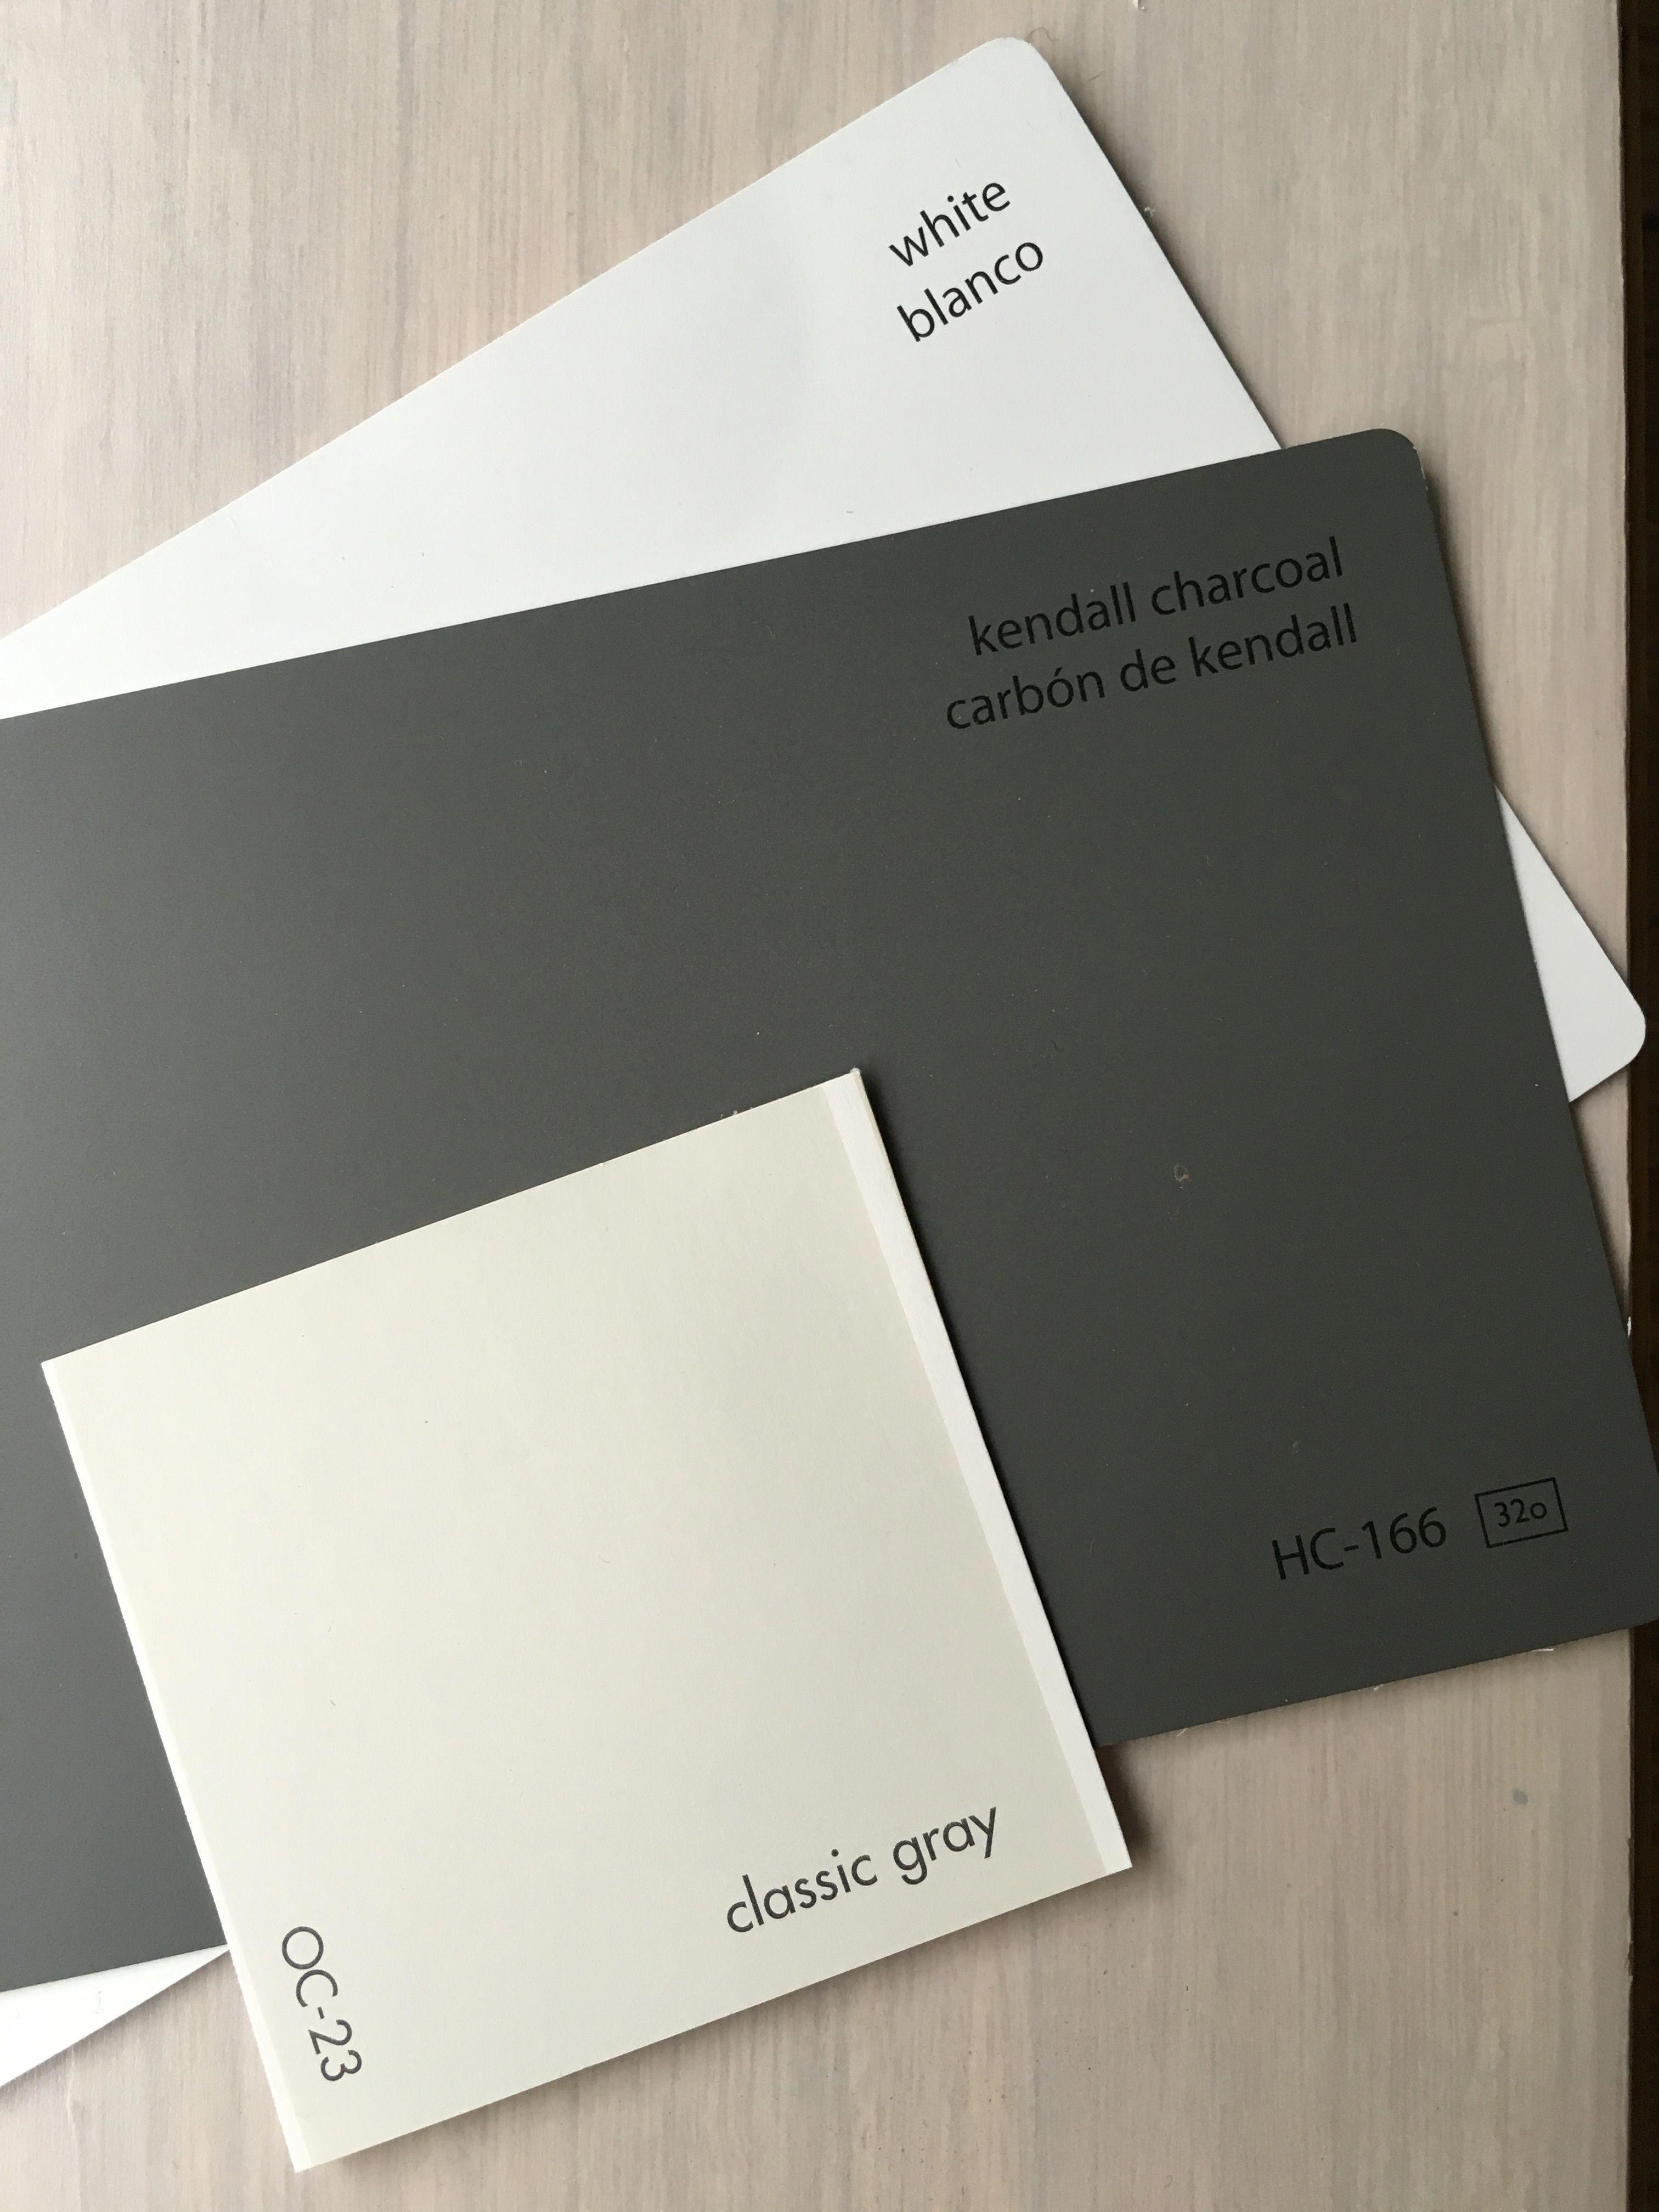 The main color palette: Benjamin Moore paint colors. Walls/paneling: Classic Gra...,  #Benjamin #Classic #Color #colors #gra #Main #mainBathroomideascolorpalettesgray #Moore #Paint #Palette #Wallspaneling